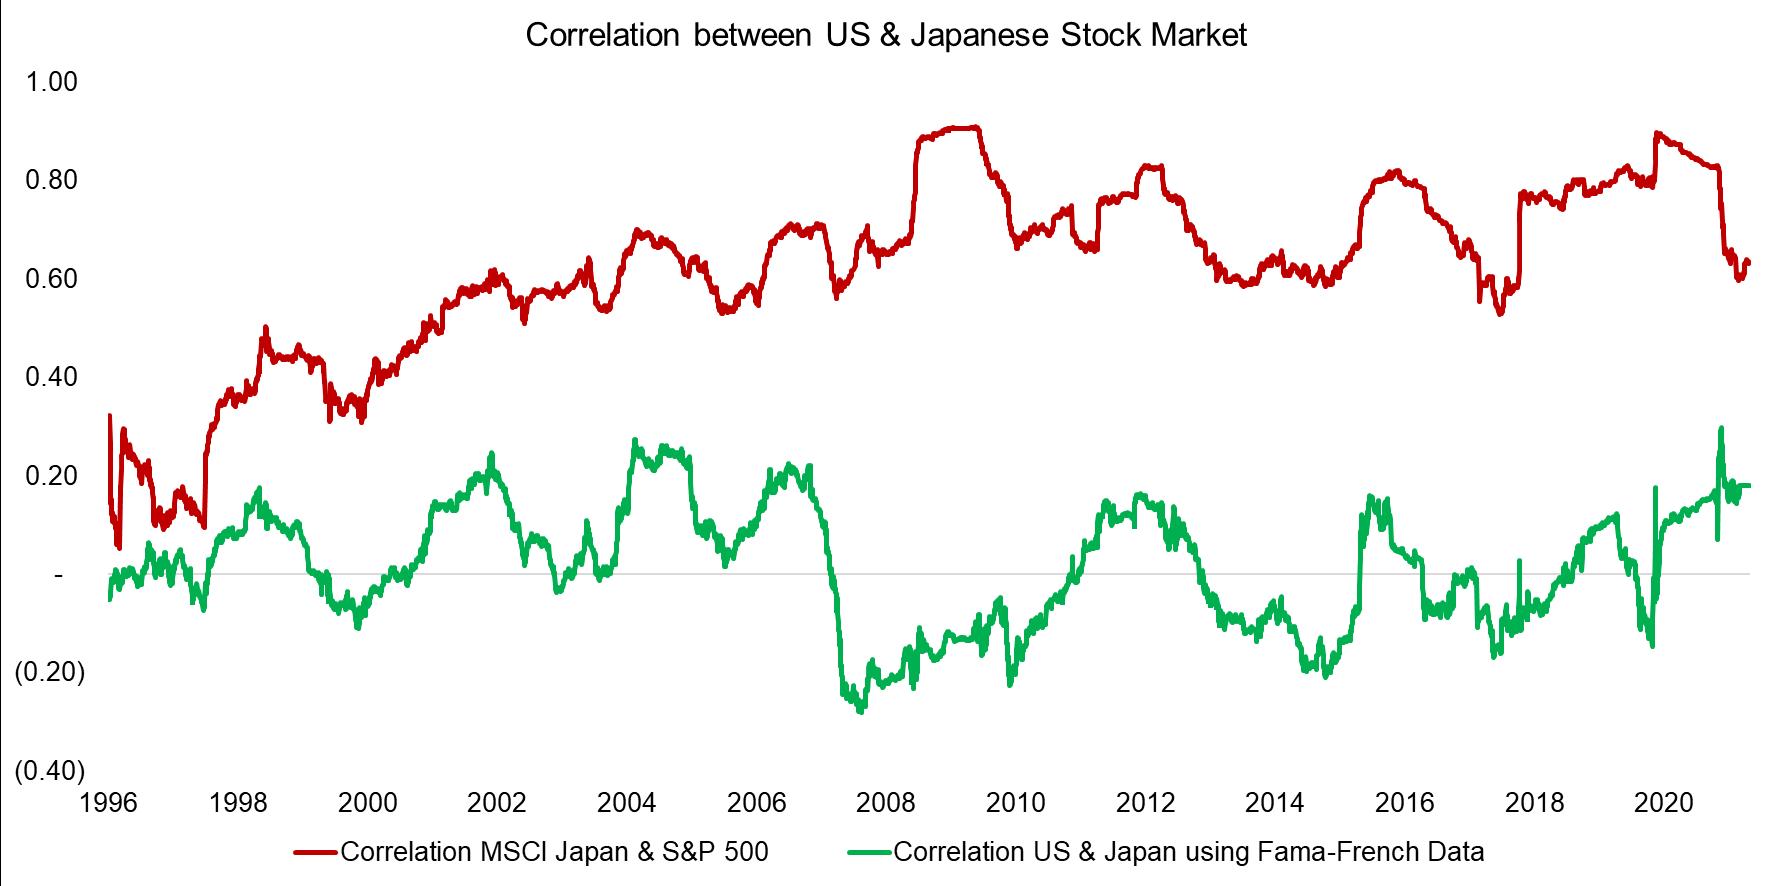 Correlation between US & Japanese Stock Market